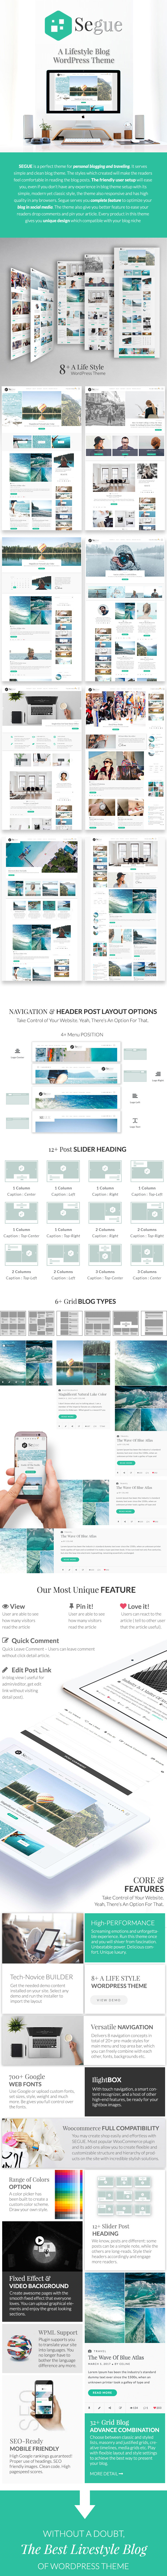 Segue - Multilayout Personal Blog WordPress Theme